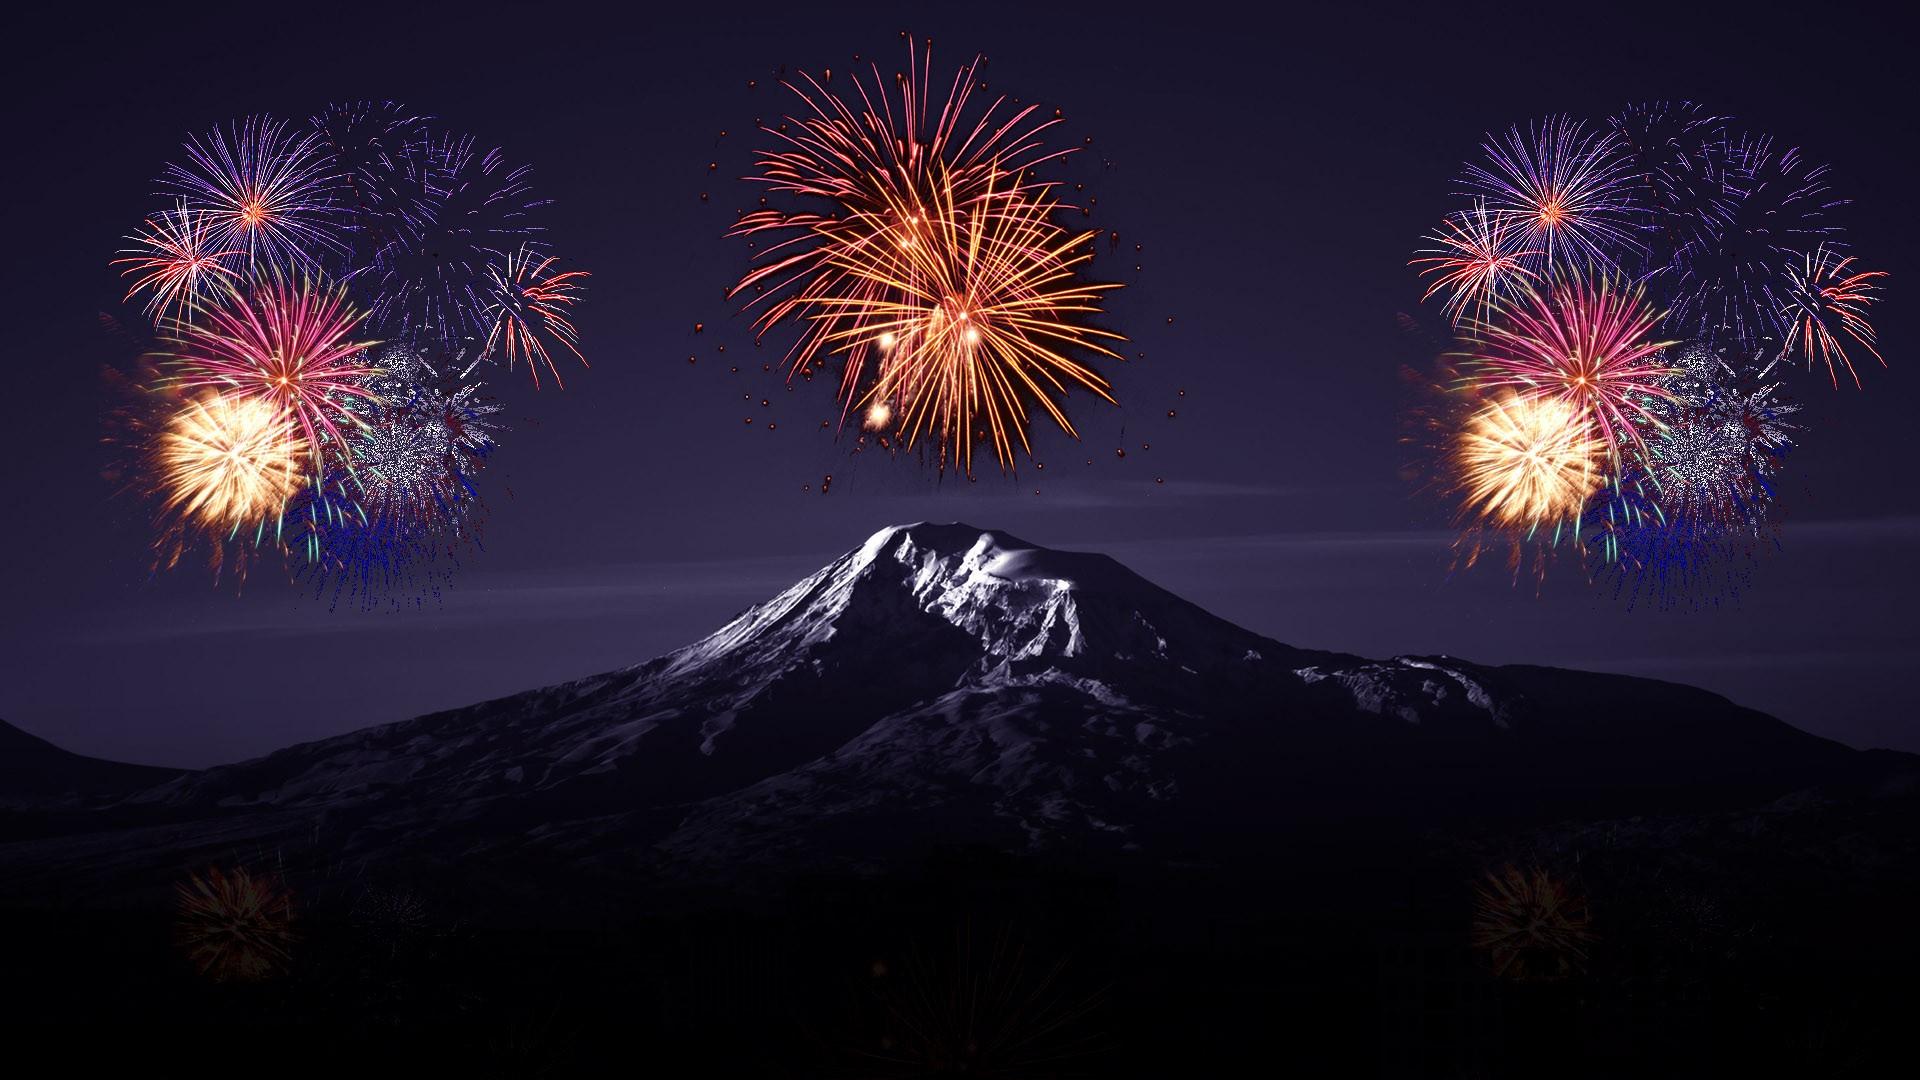 fireworks hd desktop wallpaper